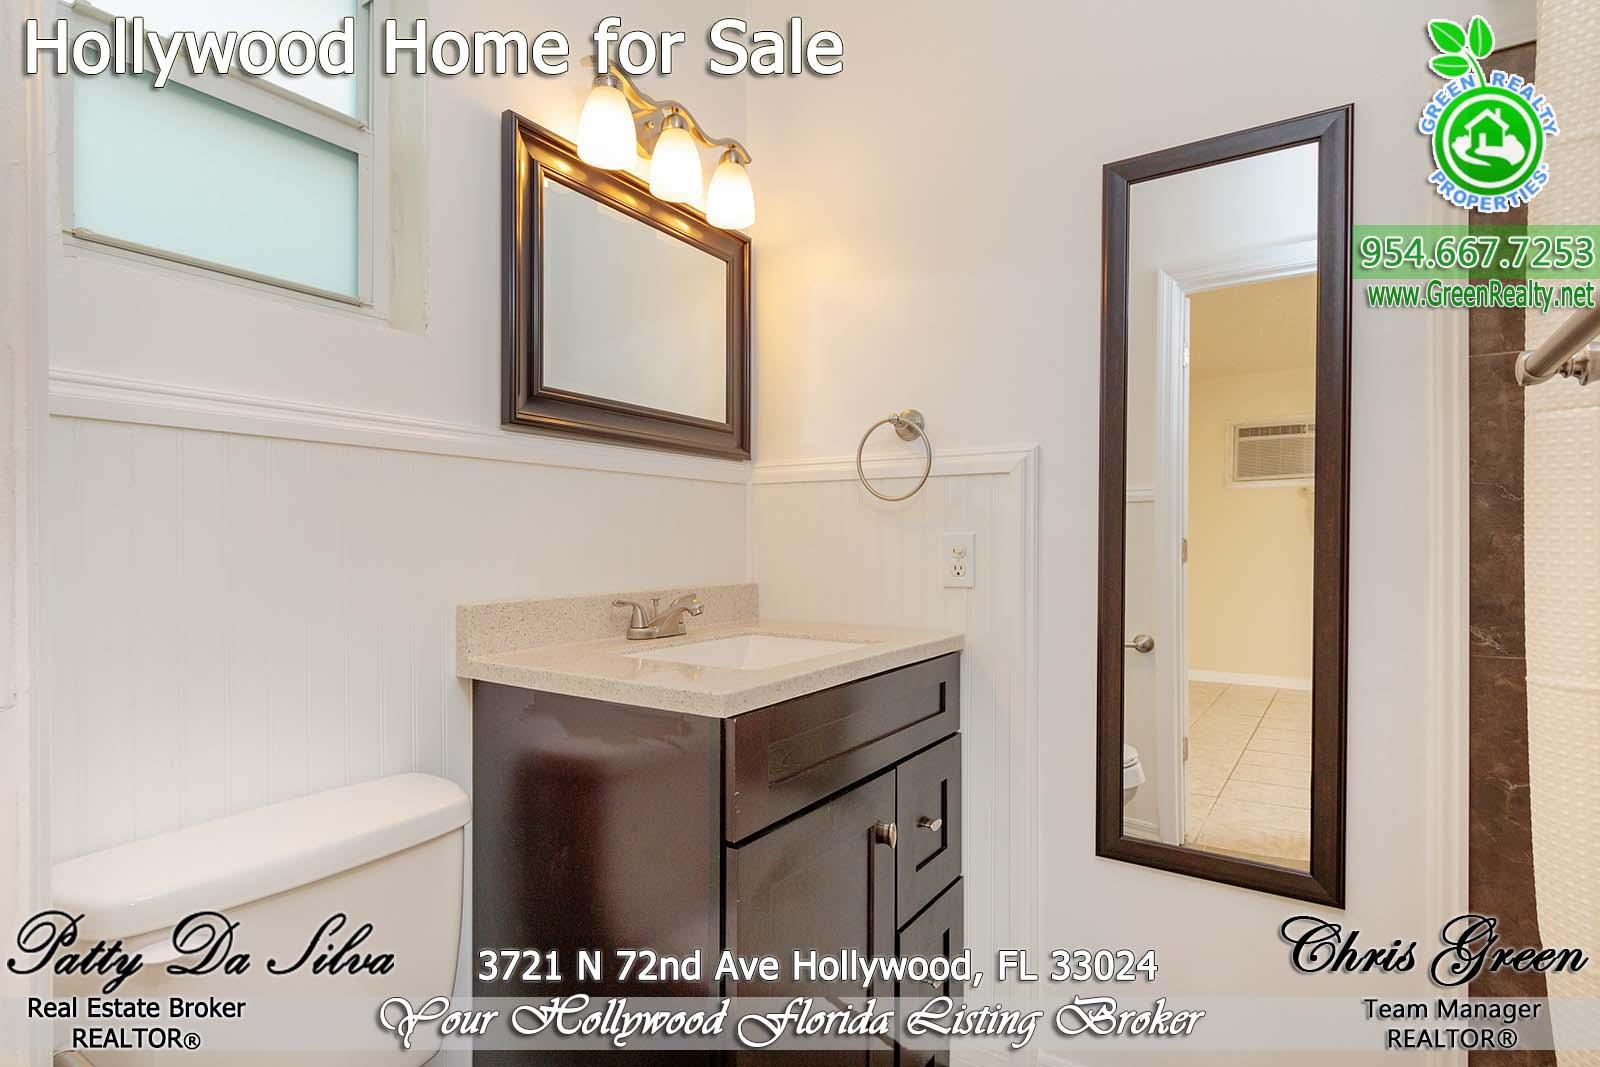 13 Hollywood Florida Real Estate Listing Patty Da Silva Green Realty properties (14)